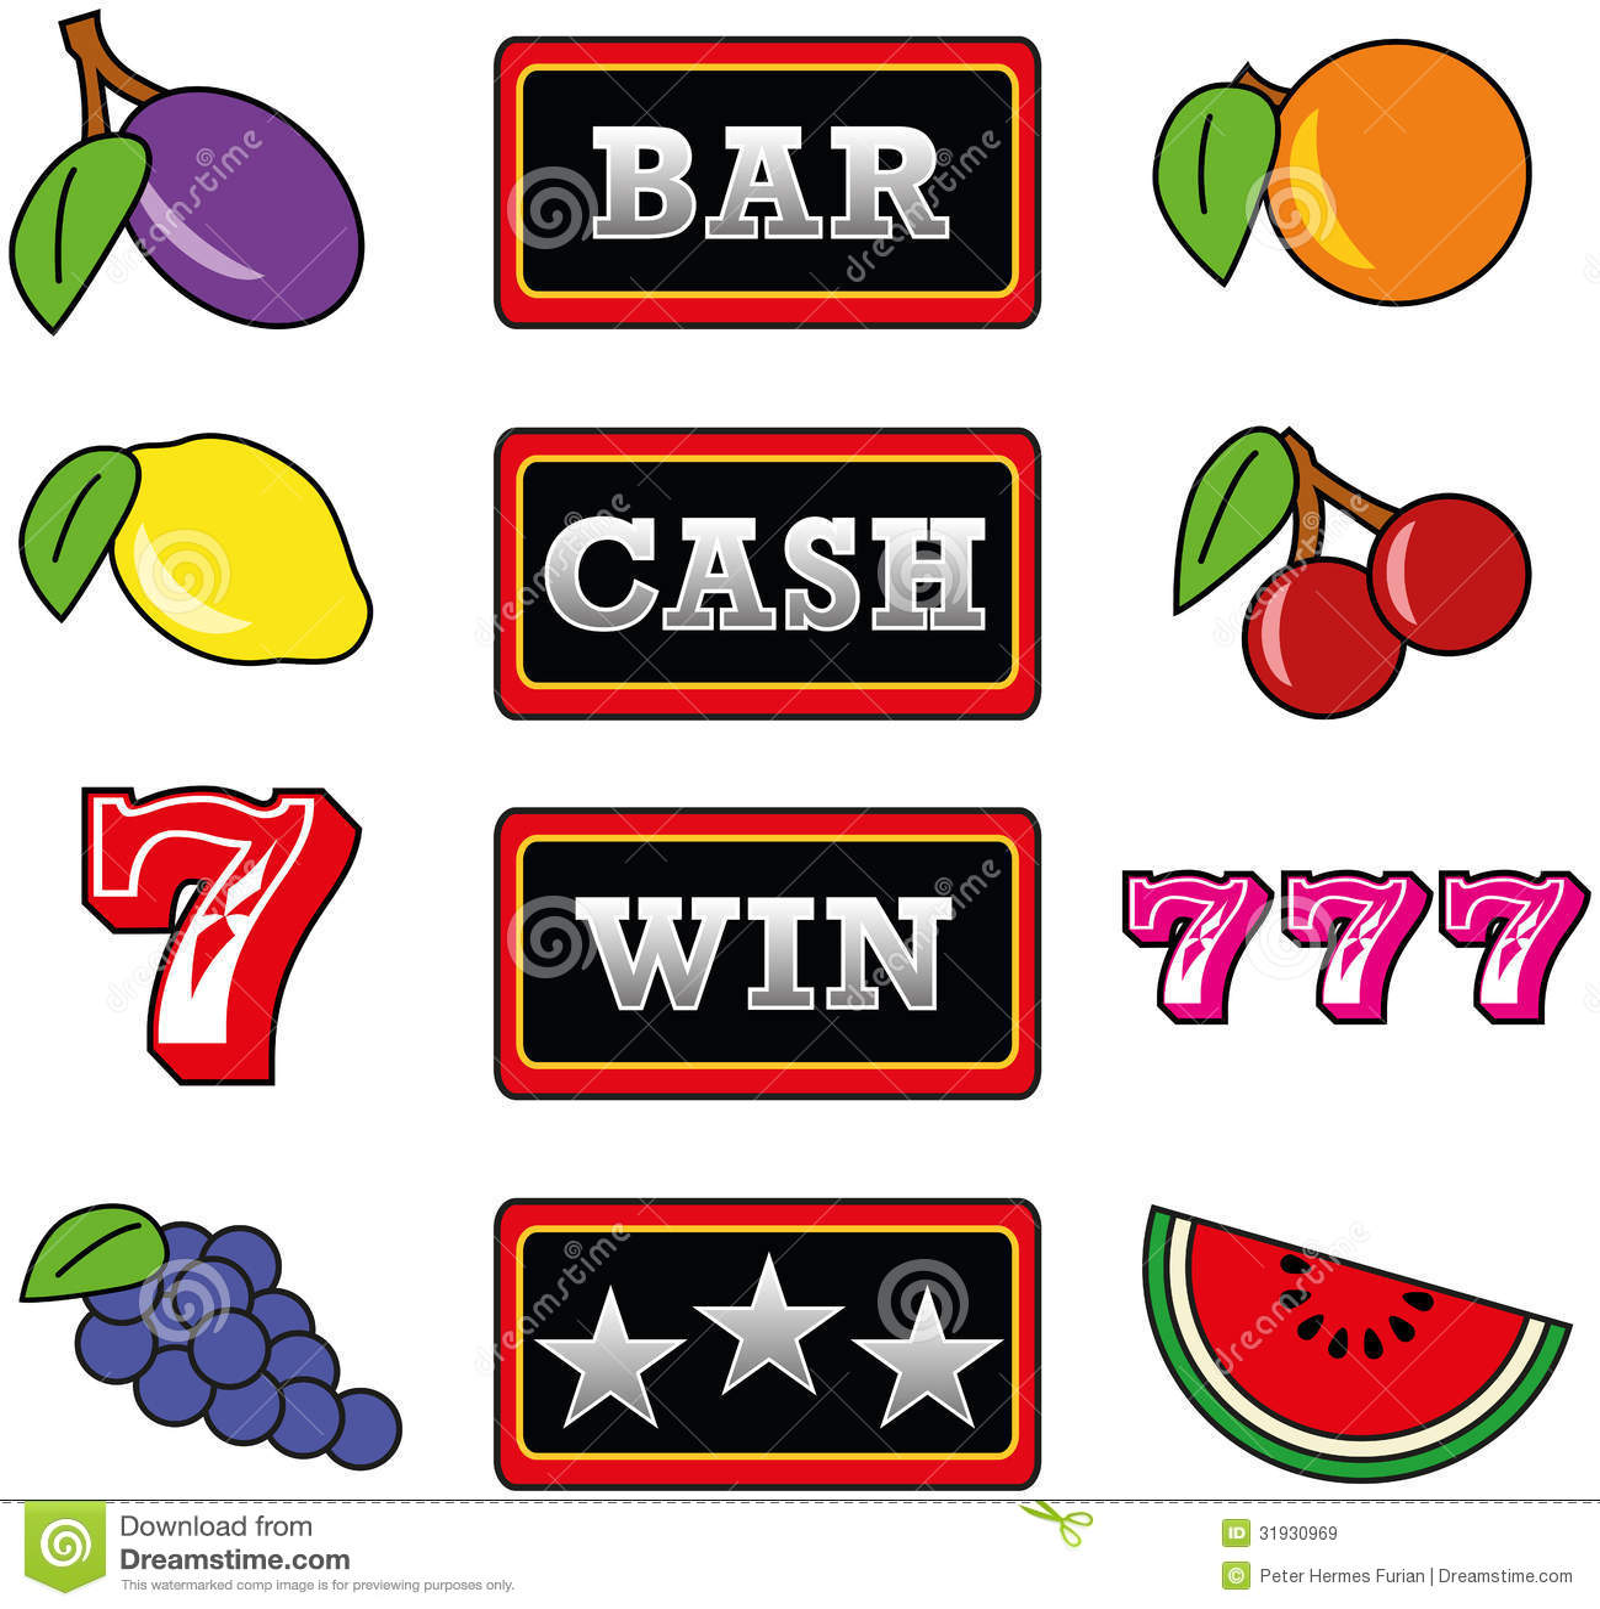 free slot machine bar